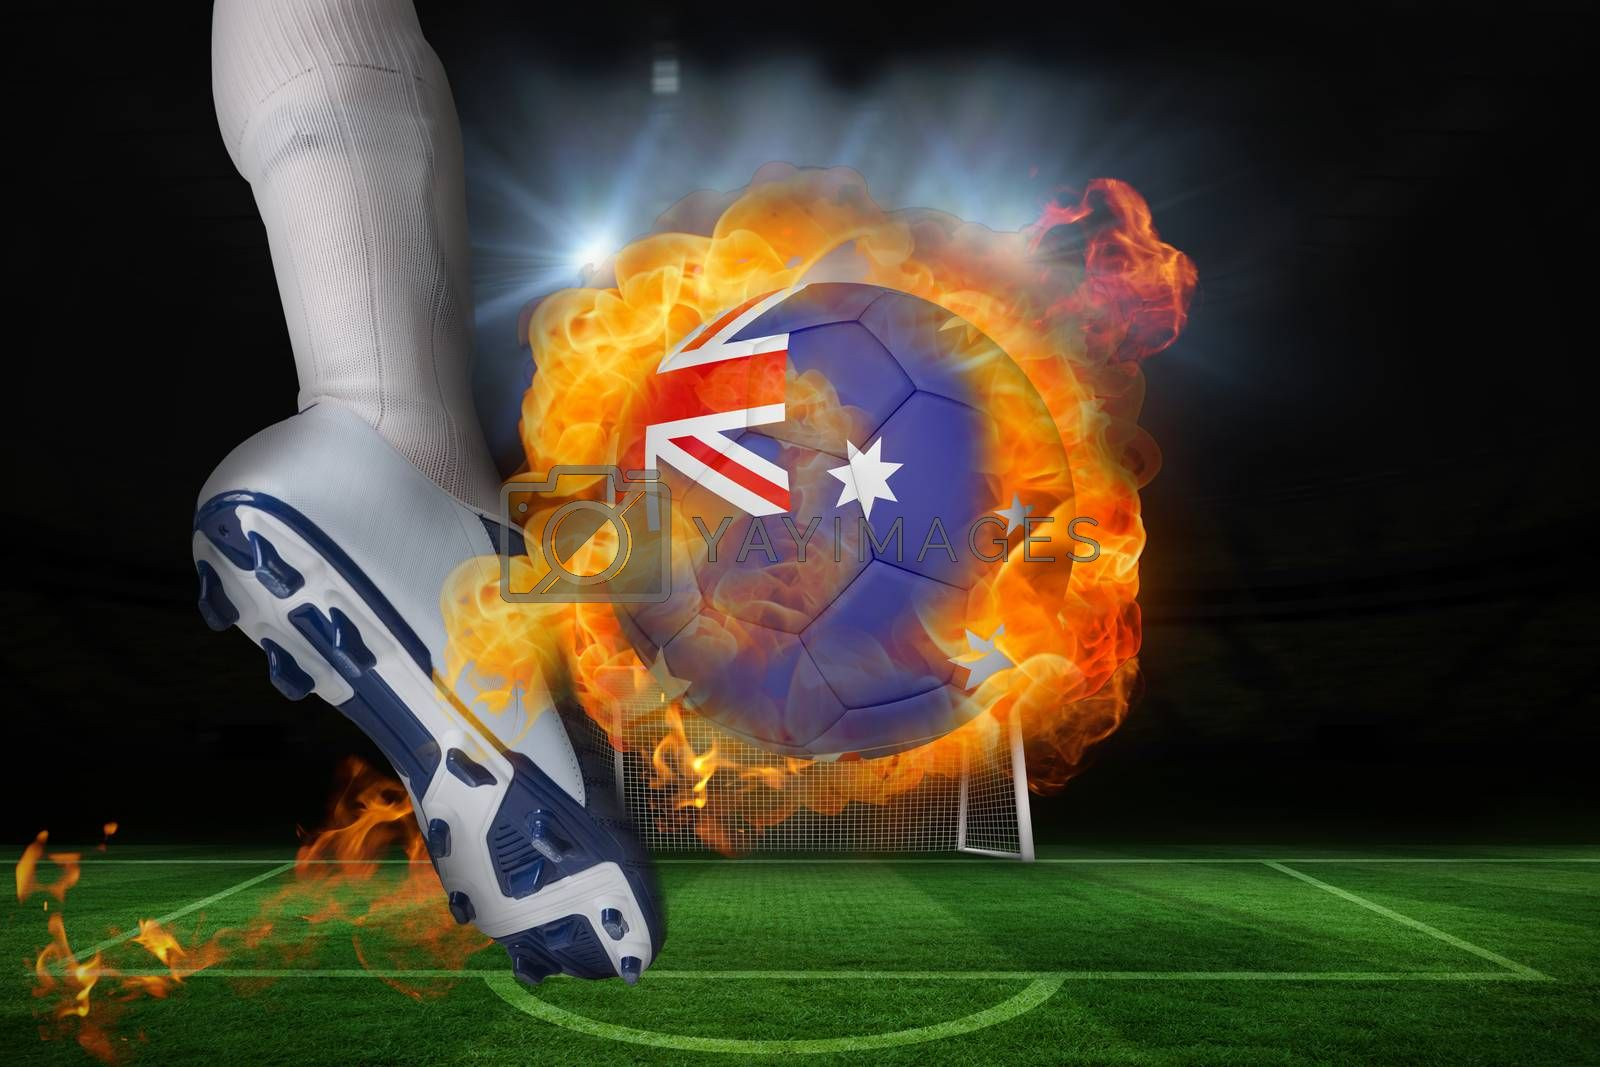 Football player kicking flaming australia flag ball by Wavebreakmedia